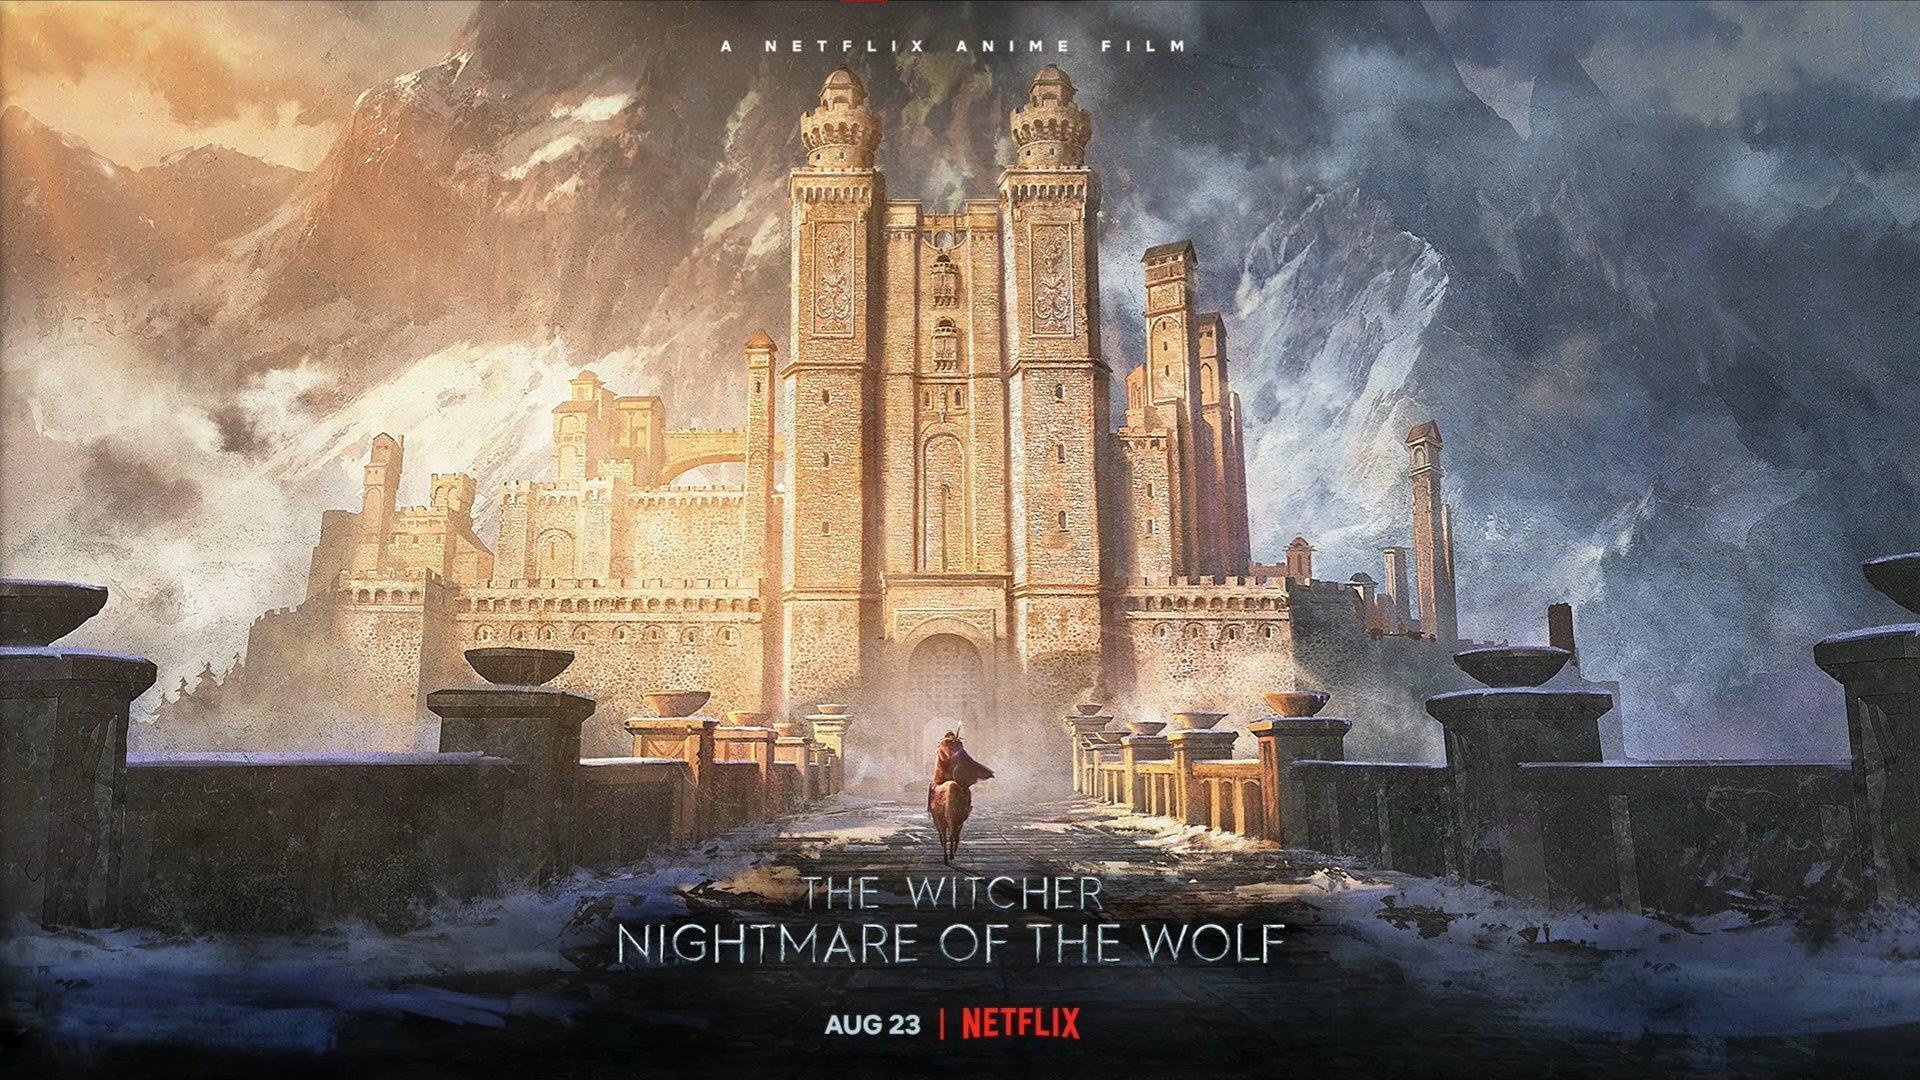 "Netfilx เปิดตัว The Witcher: Nightmare of the Wolf หรือในชื่อไทยคือ ""เดอะ วิทเชอร์ นักล่าจอมอสูร: ตำนานหมาป่า"""